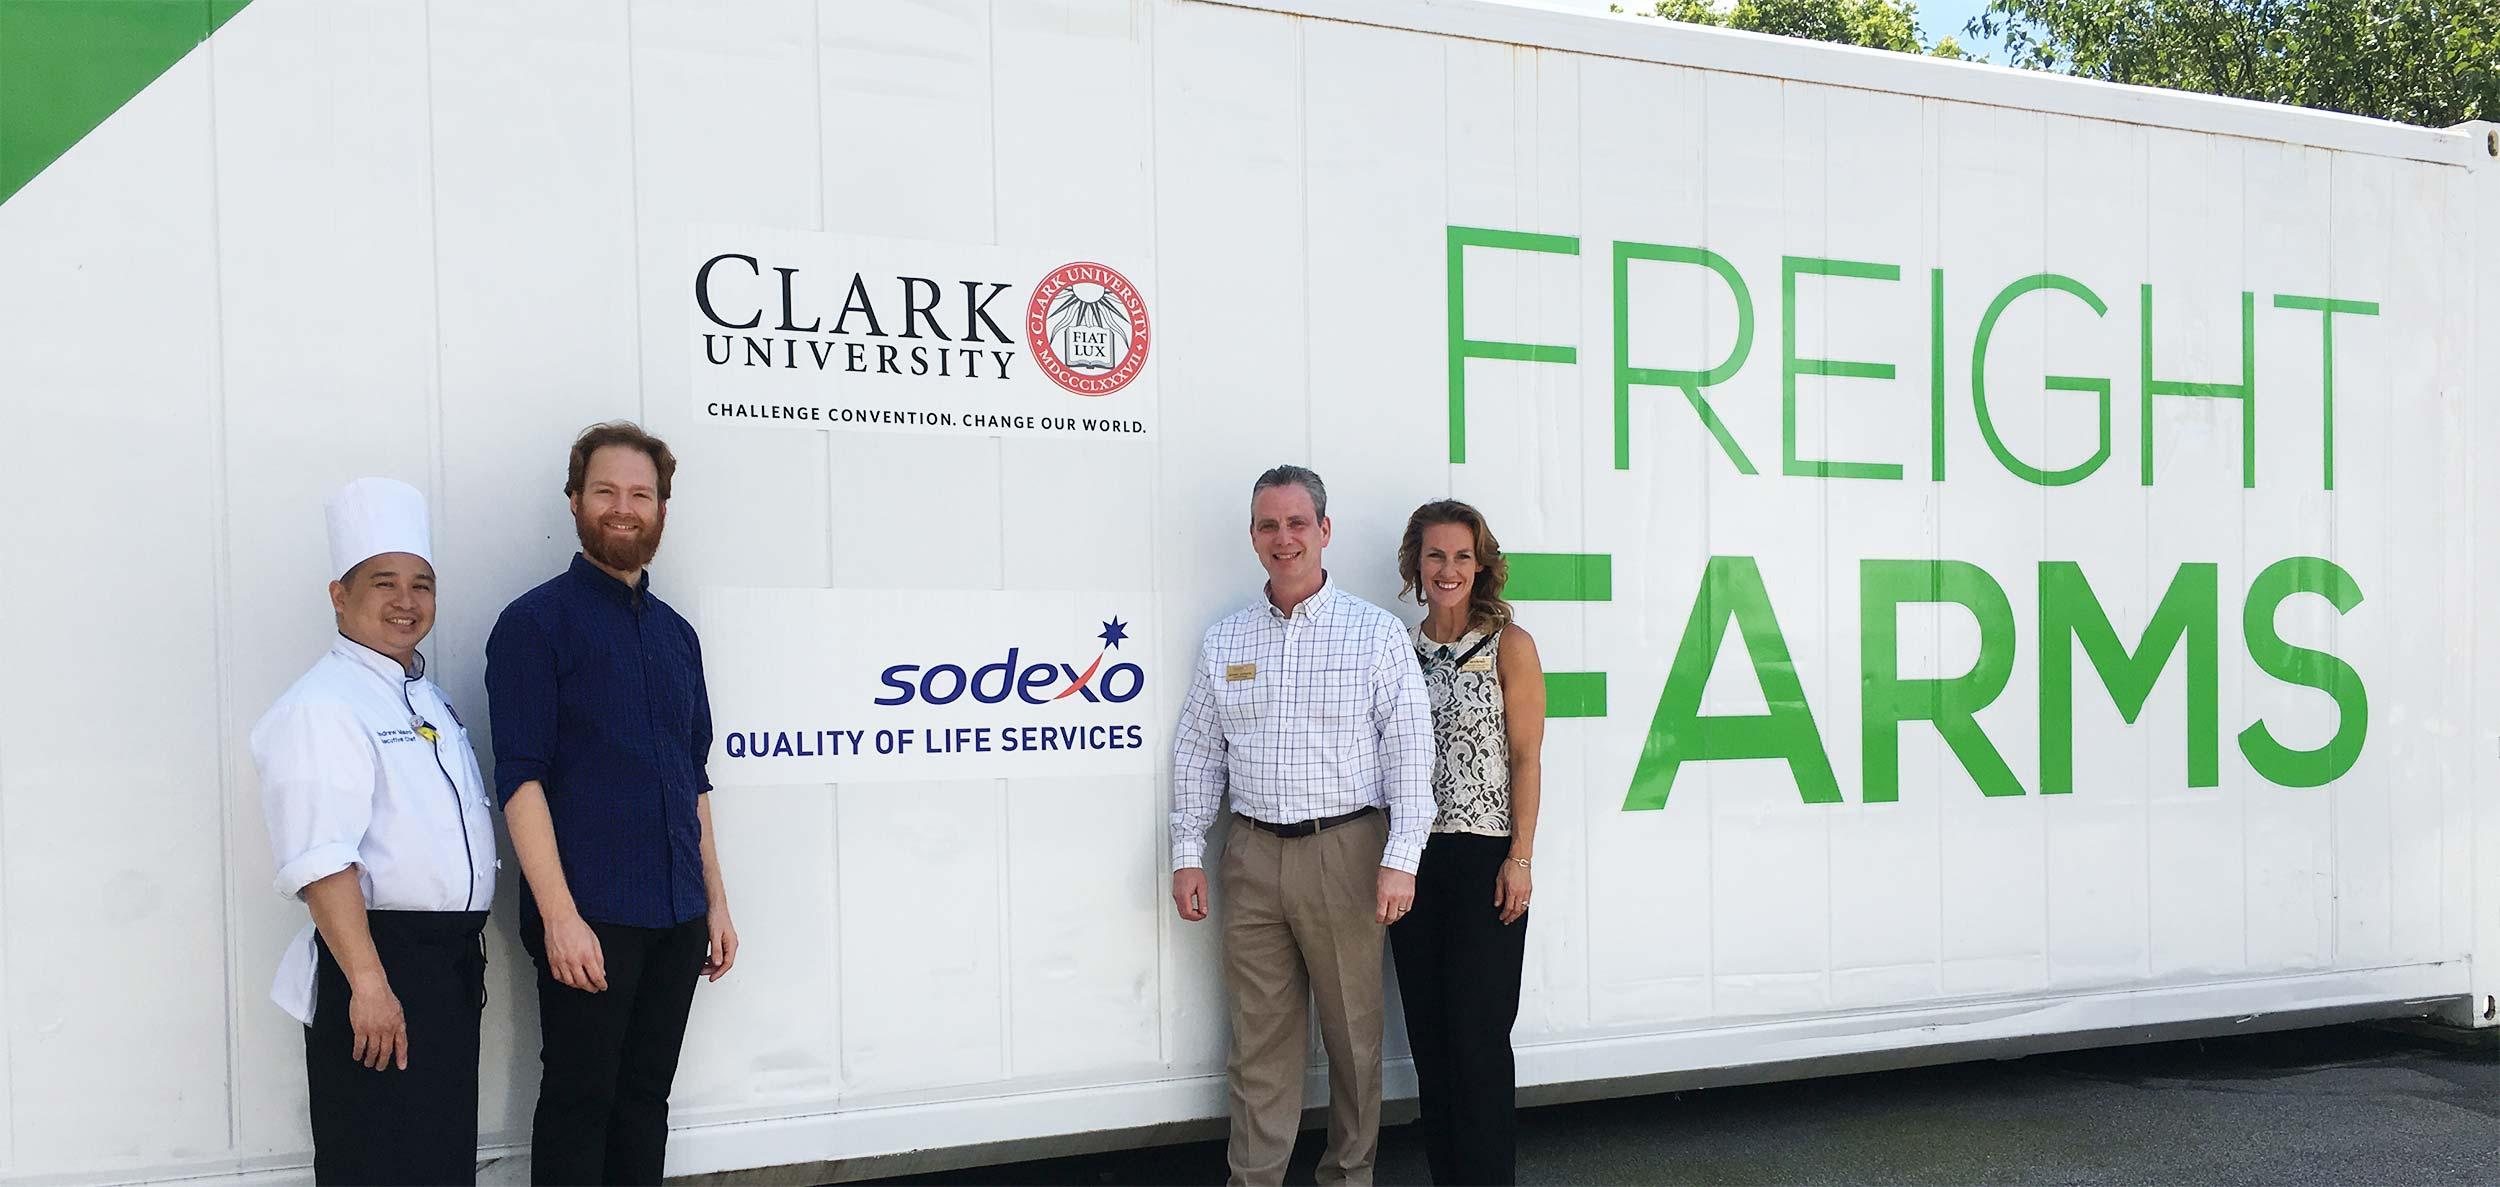 Freight Farms_Clark University & Sodexo.jpg